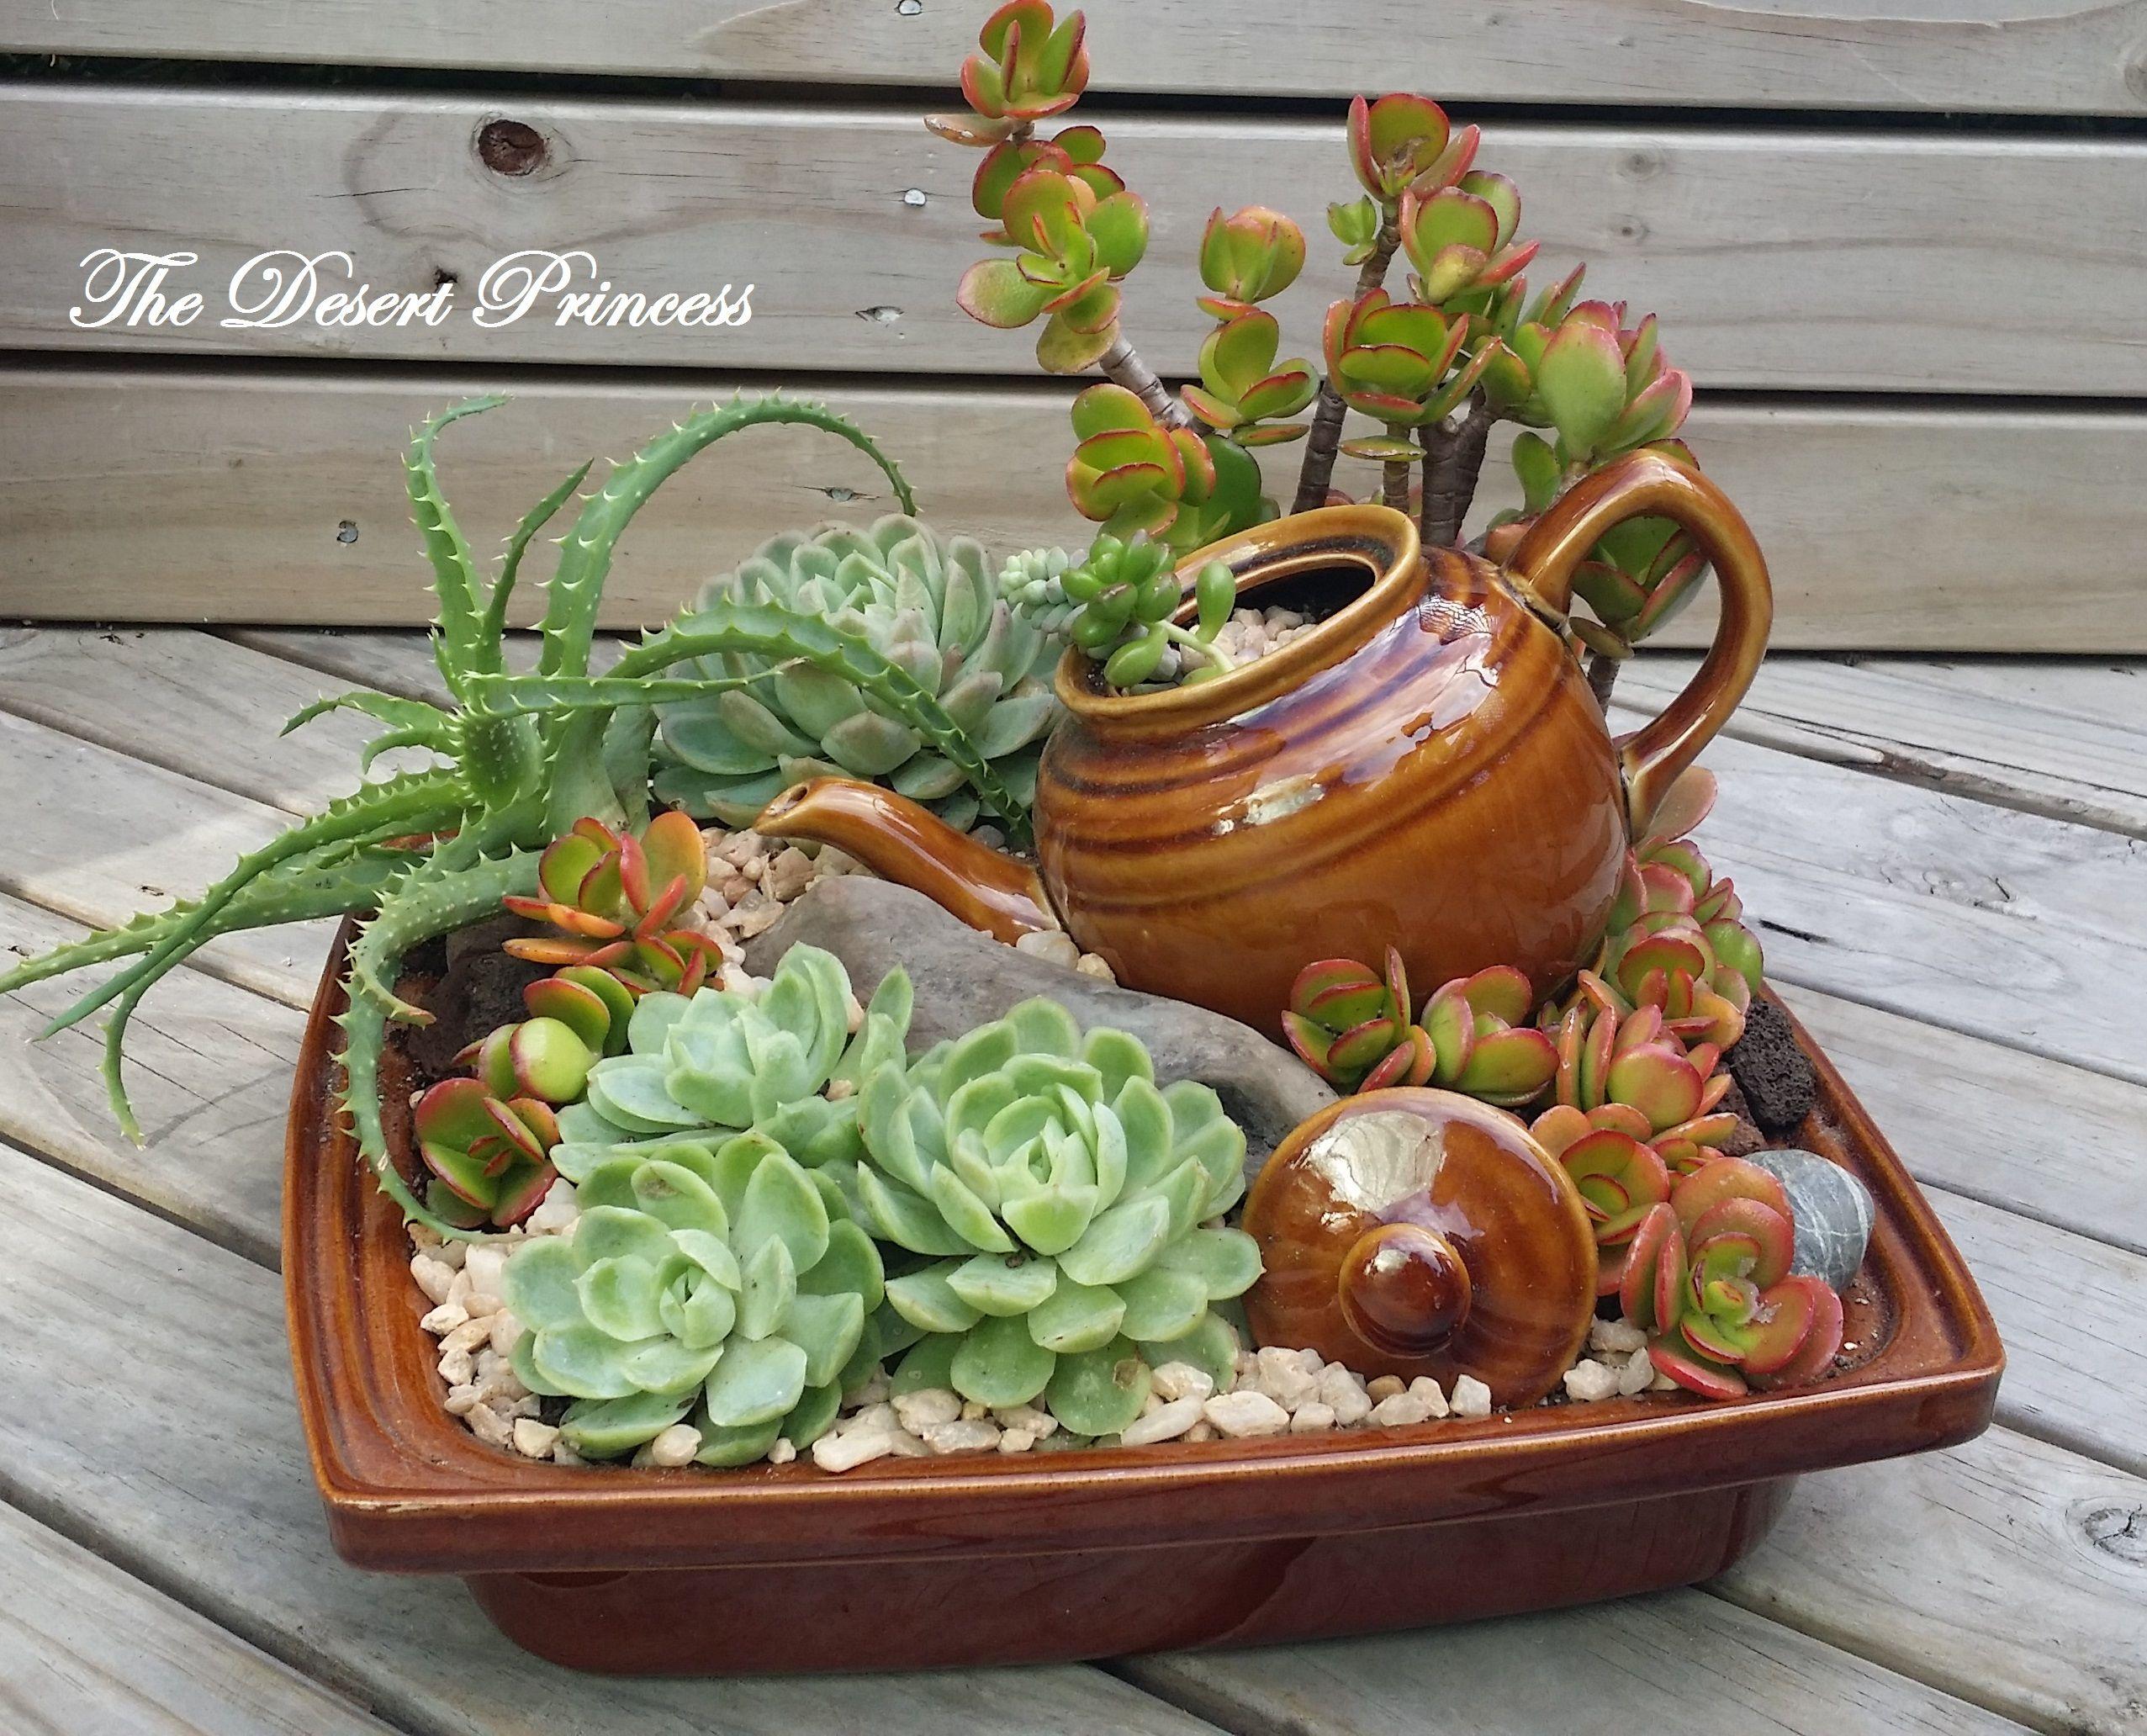 Succulent Mini Garden Design By The Desert Princess Www Facebook Thedesertprincess1006